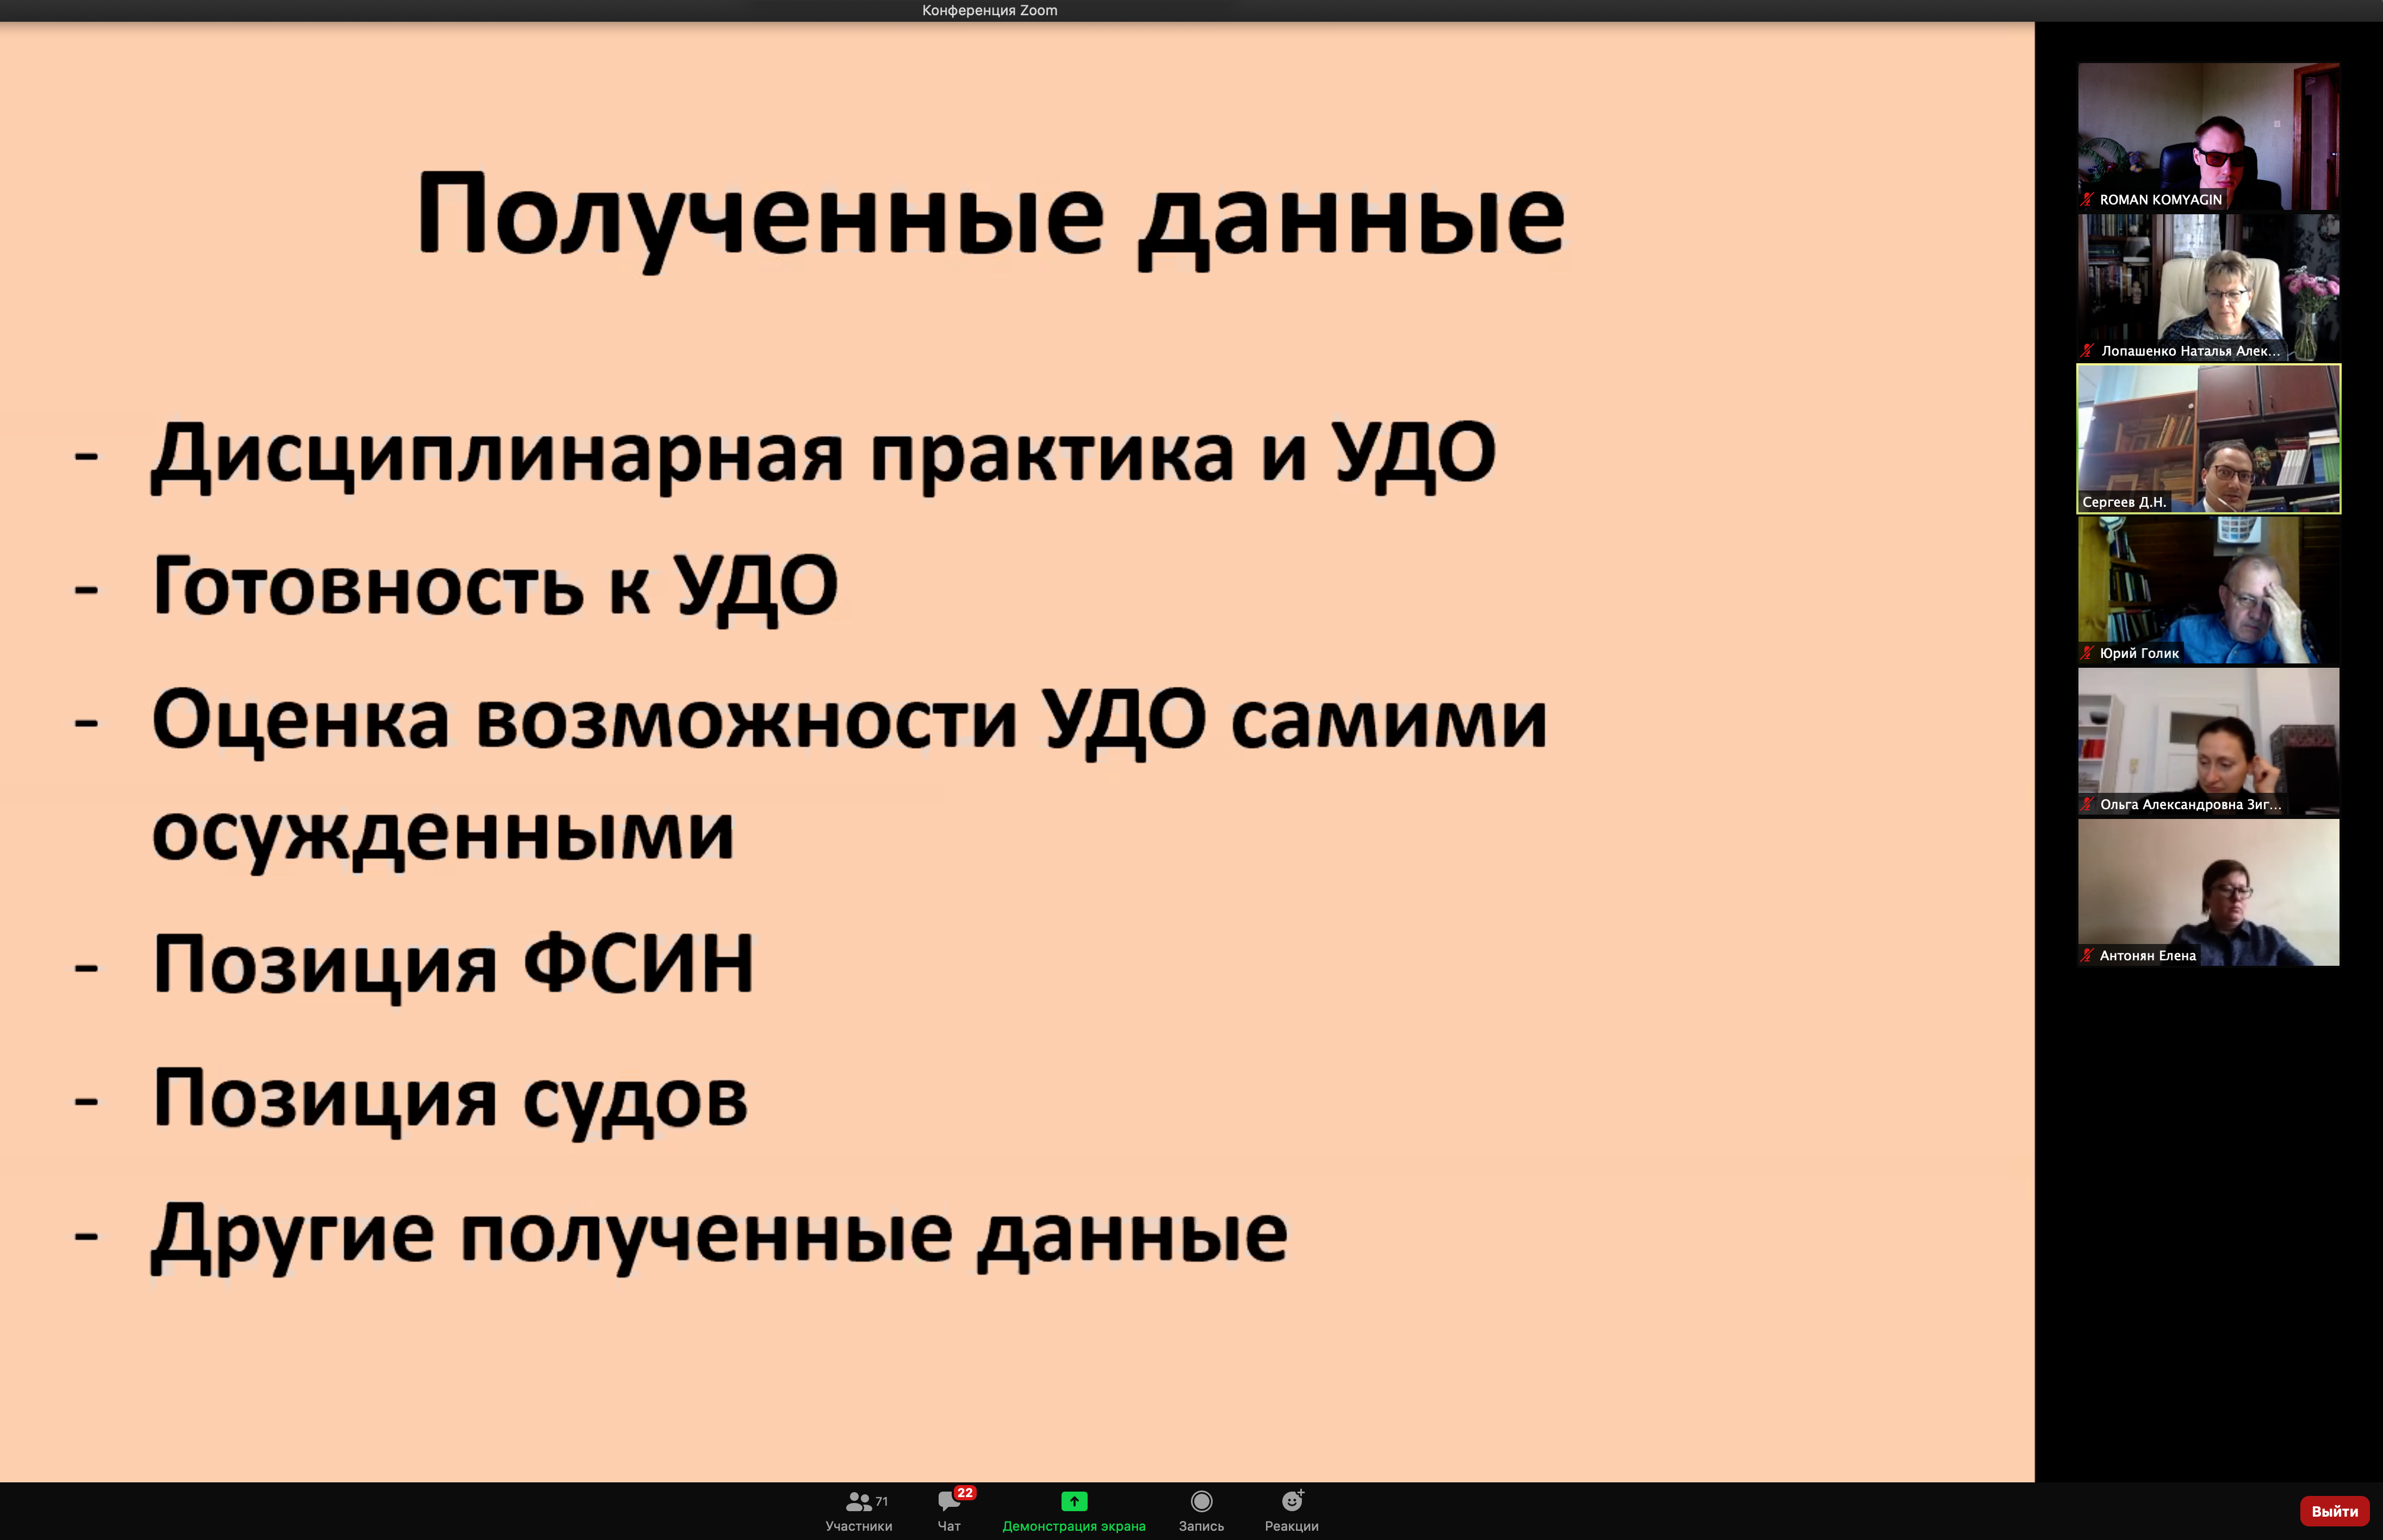 Снимок экрана 2020-09-24 в 16.51.51